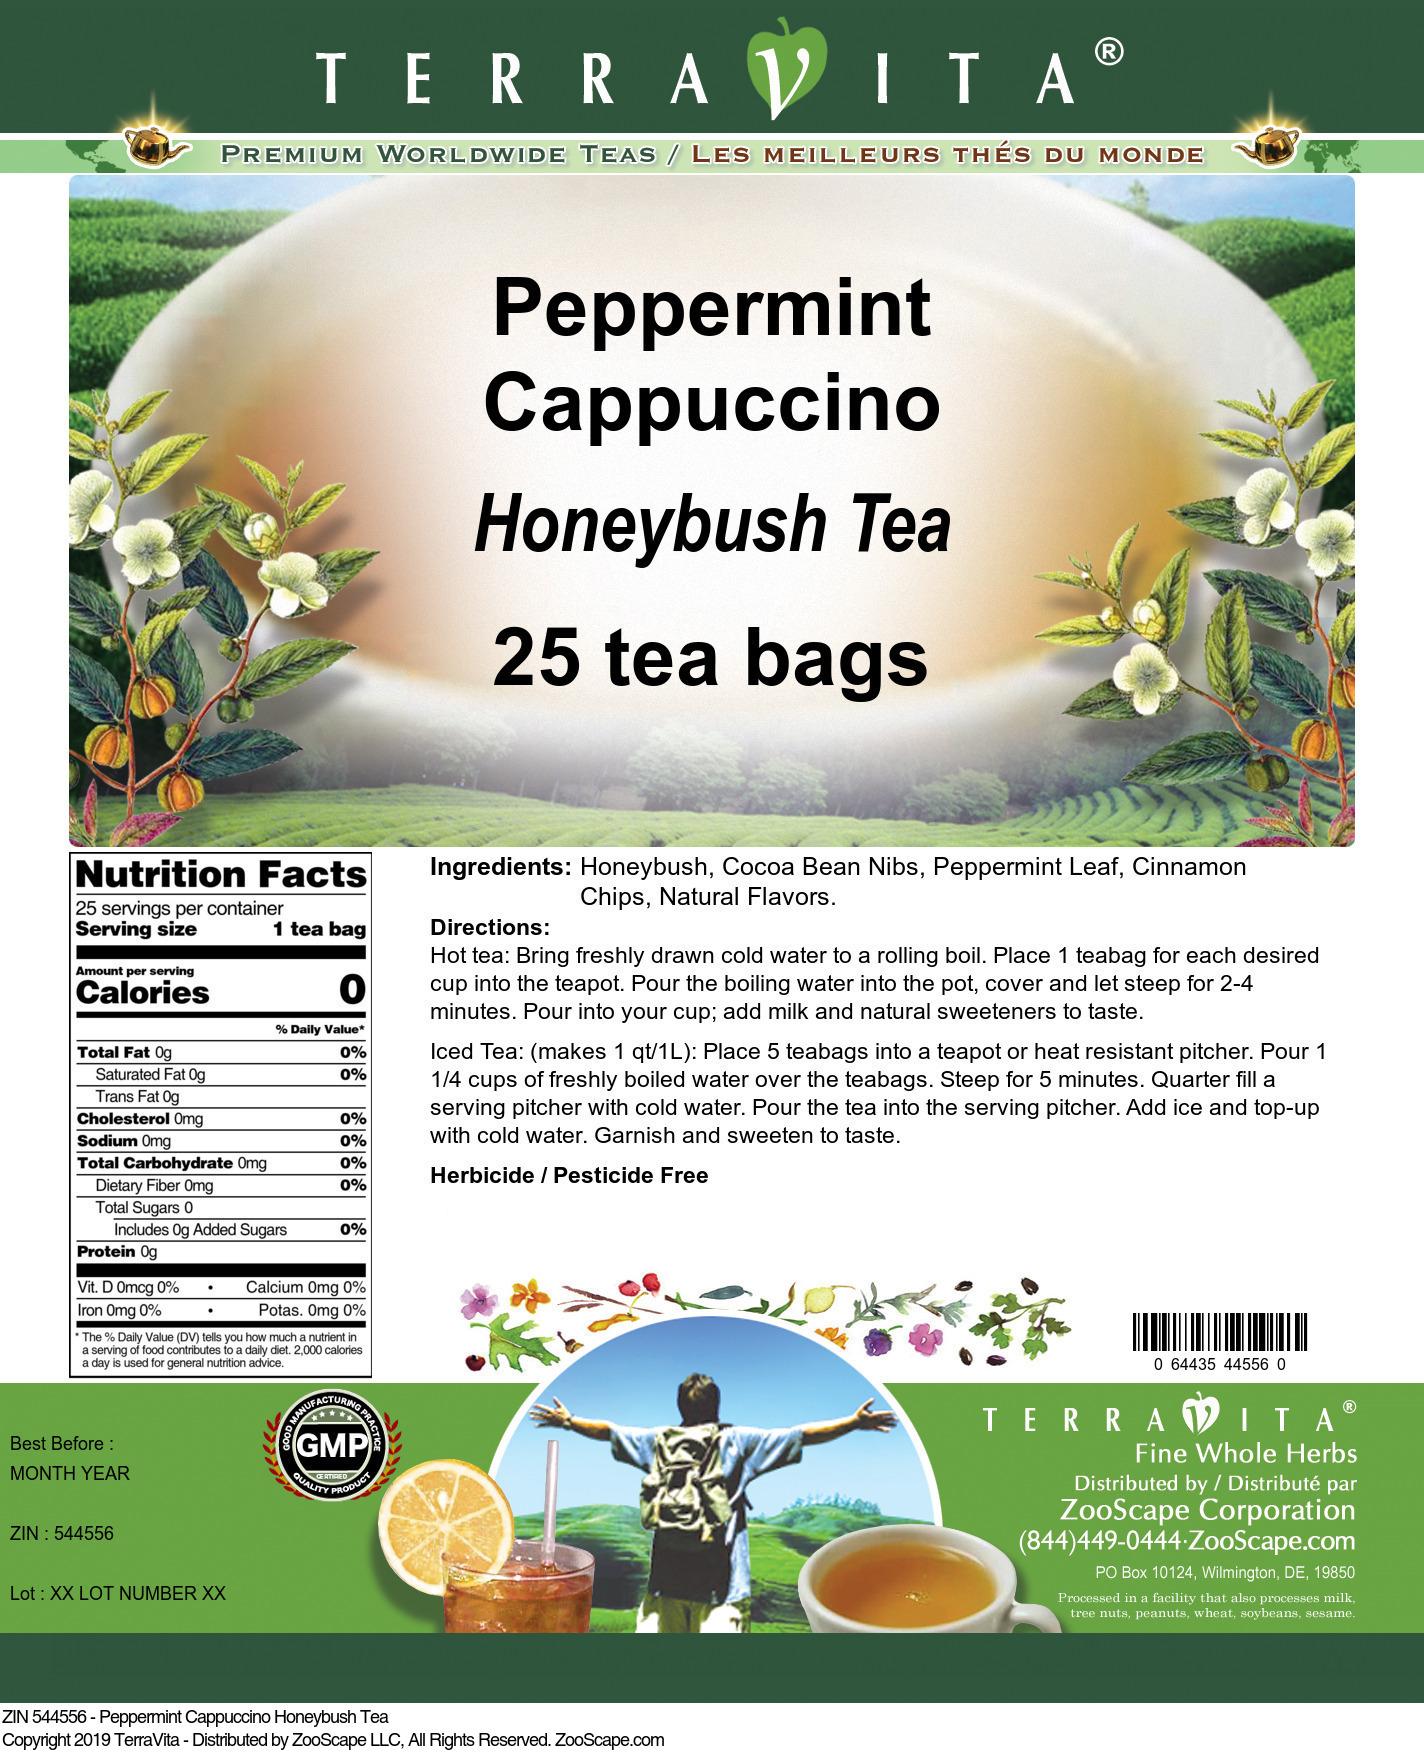 Peppermint Cappuccino Honeybush Tea